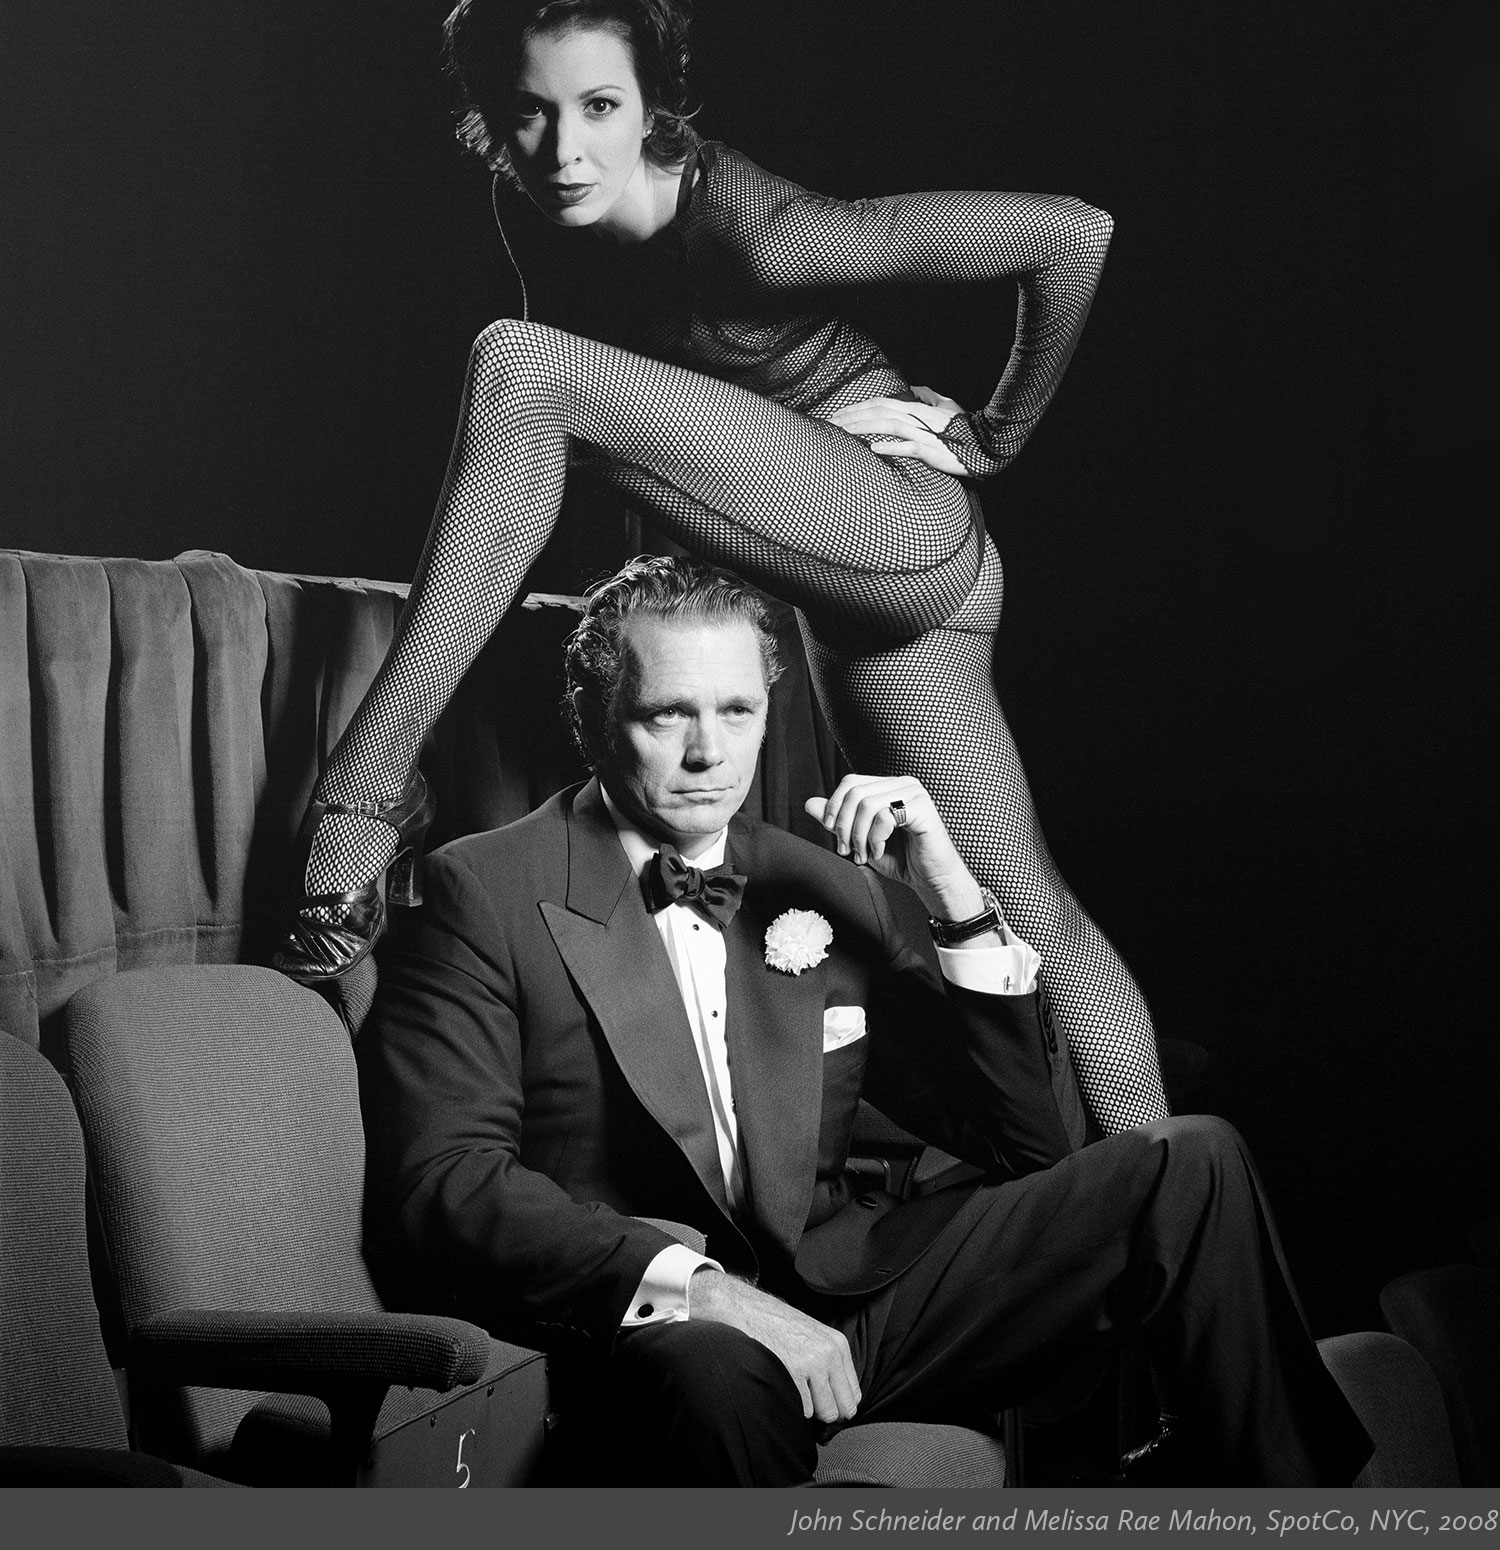 5_John-Schneider-and-Melissa-Rae-Mahon_SpotCo_NYC_2008.jpg